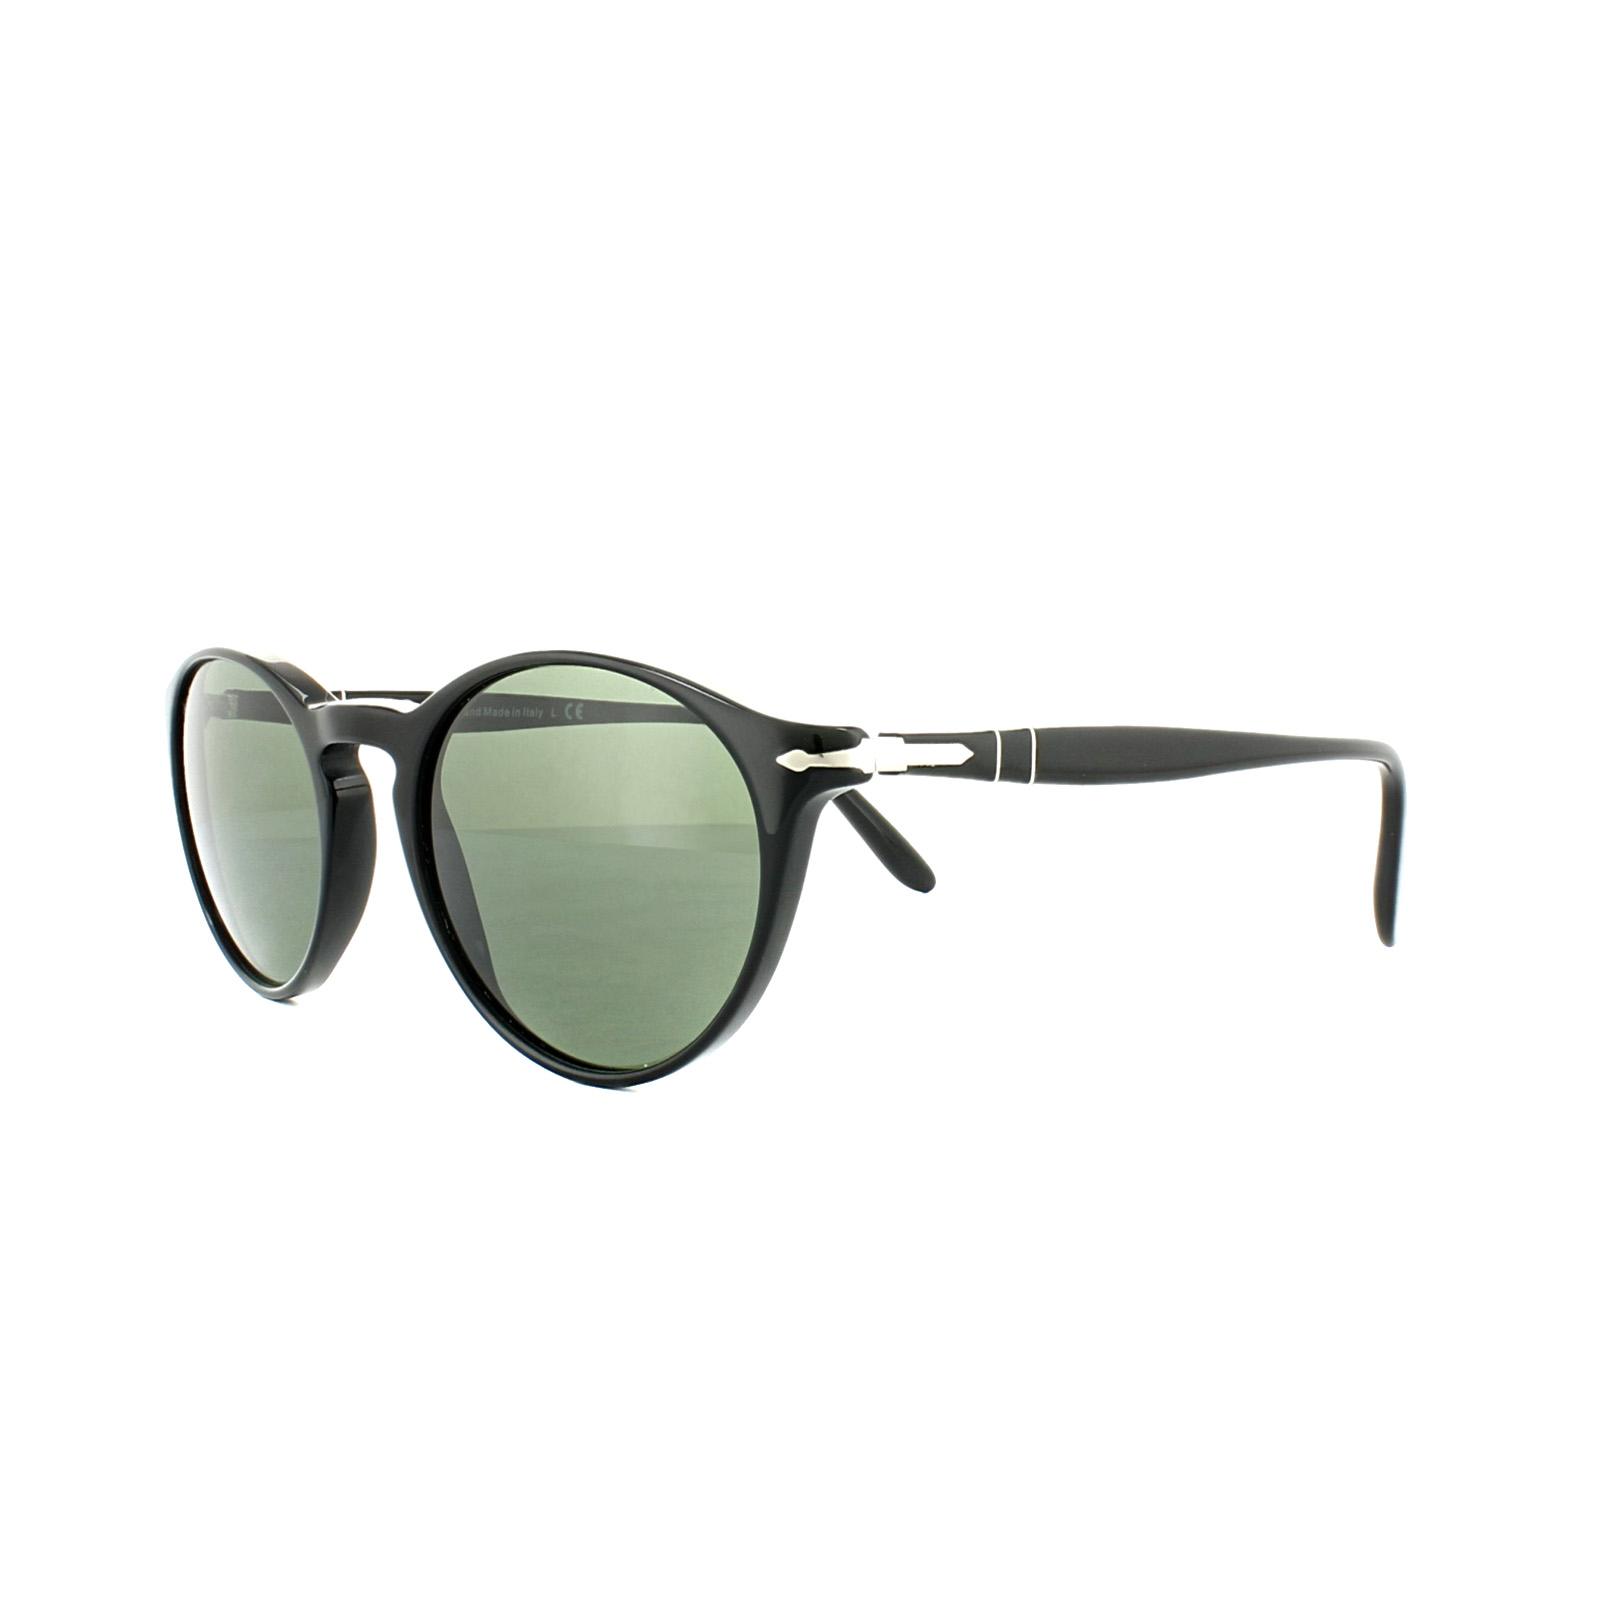 04e04668cf Sentinel Persol Sunglasses 3092SM 901431 Black Crystal Grey Green